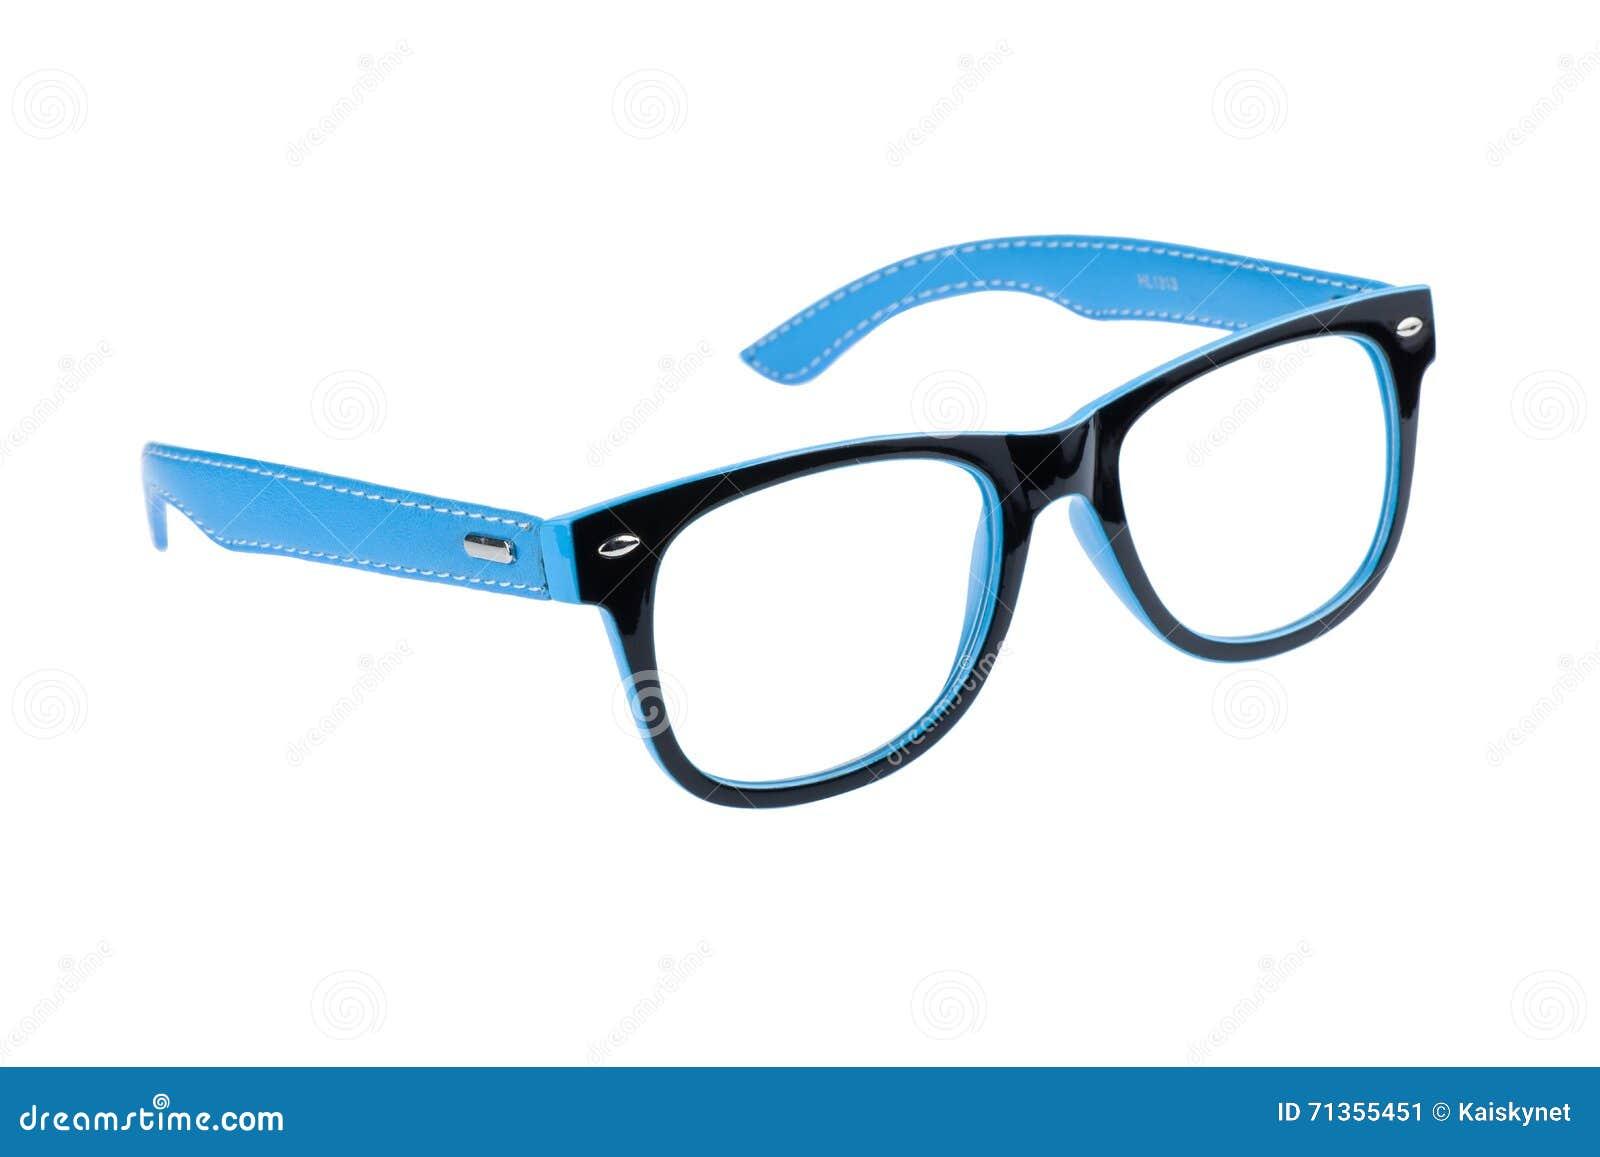 Blue And Black Frame Of Eye Glasses Isolated On White